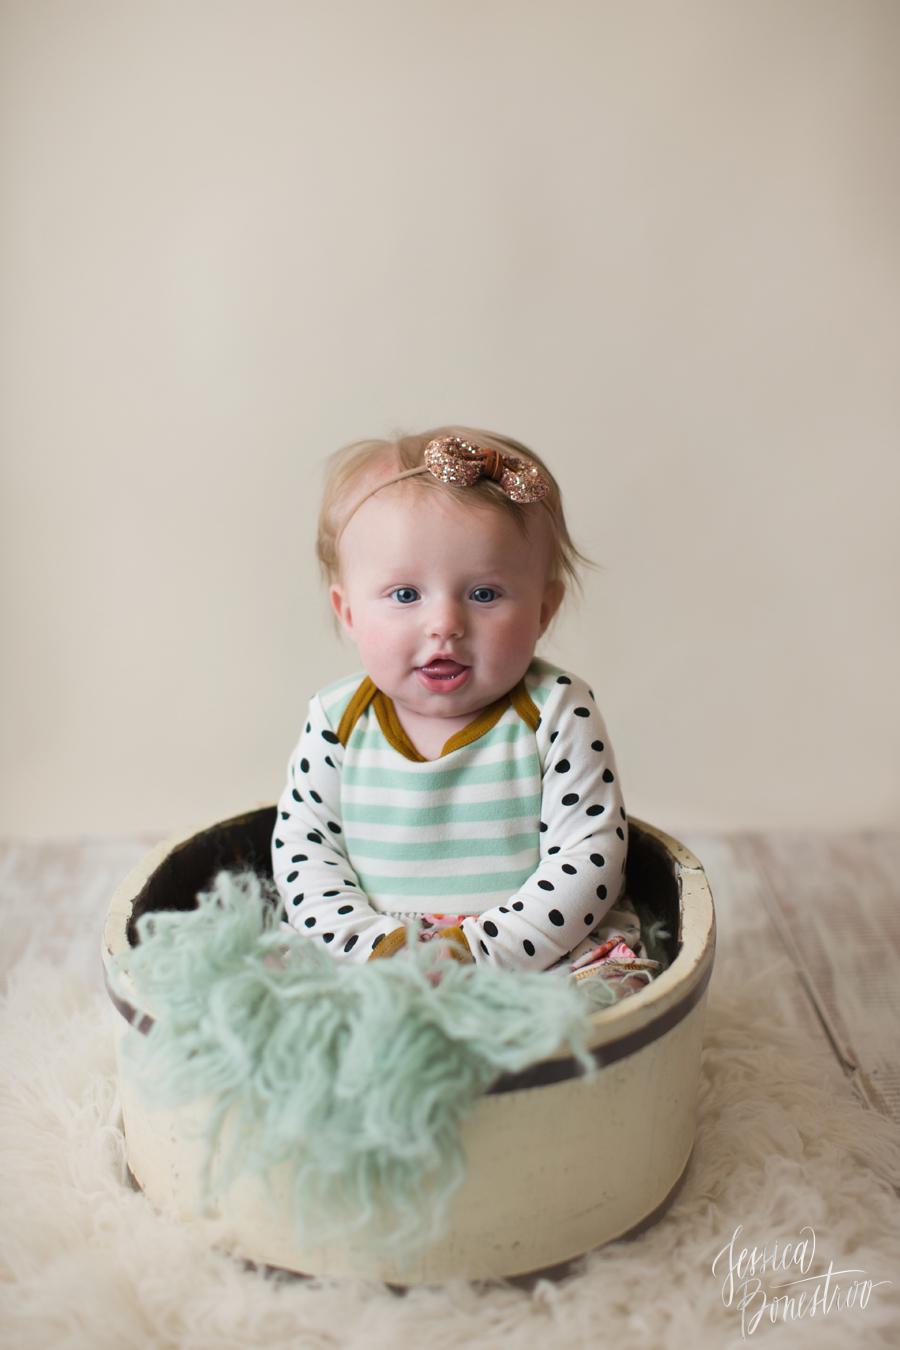 hadley, 4 months, iowa baby photographer, baby girl, baby plan, Jessica Bonestroo Photography